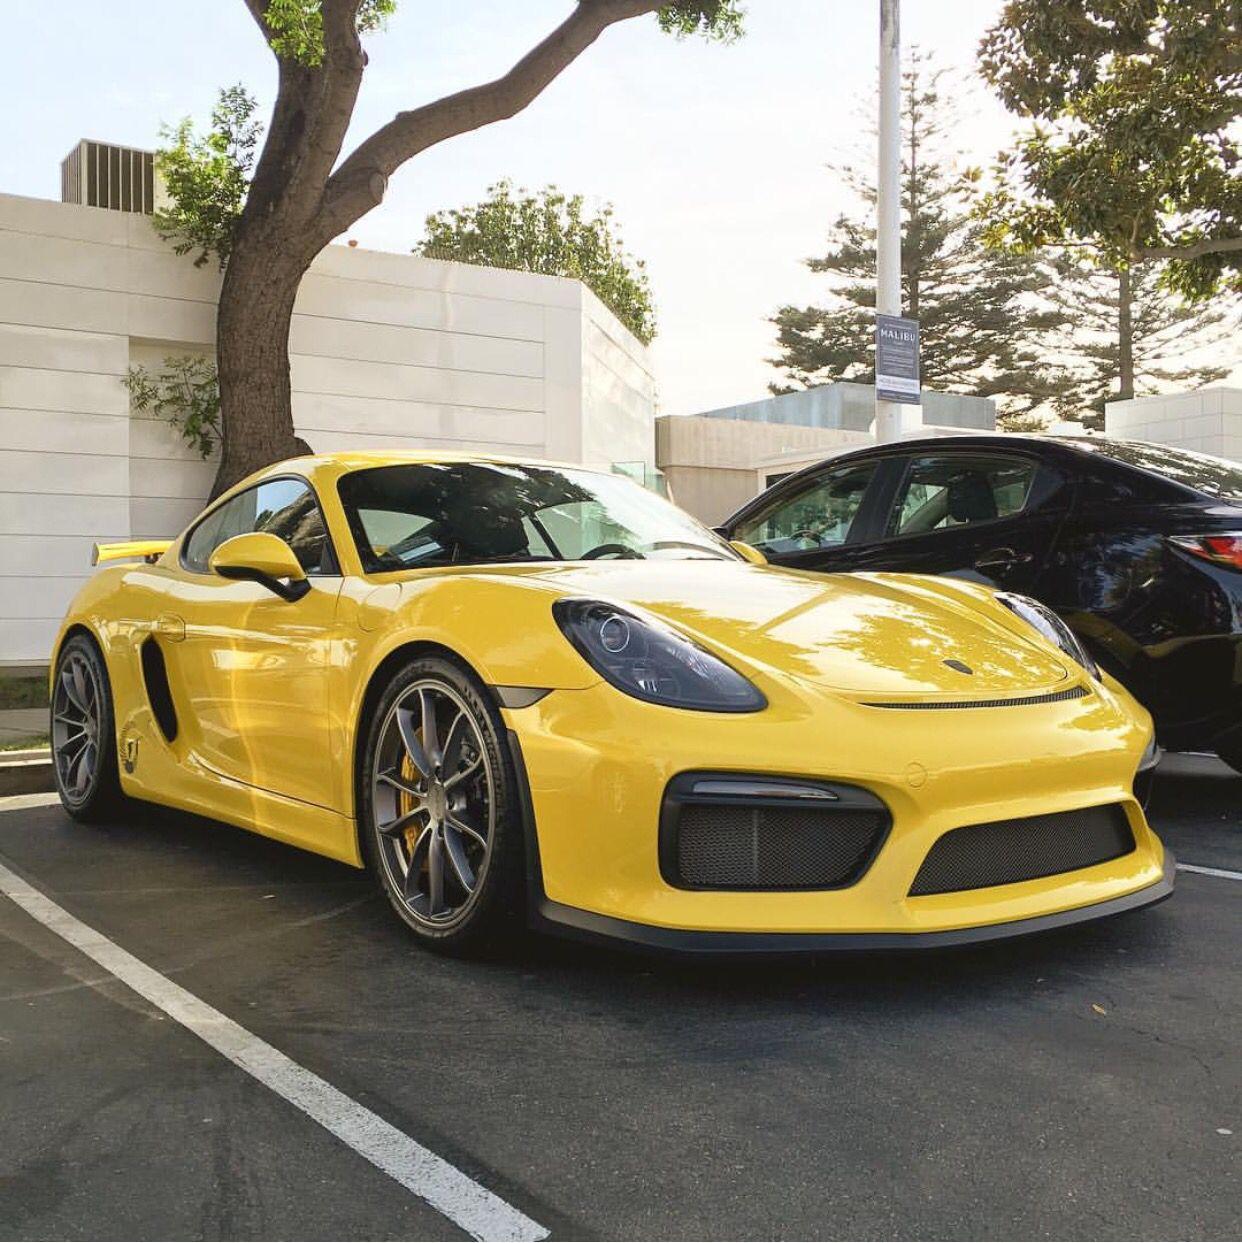 Porsche Cayman: Porsche Cayman GT4 Painted In Racing Yellow Photo Taken By